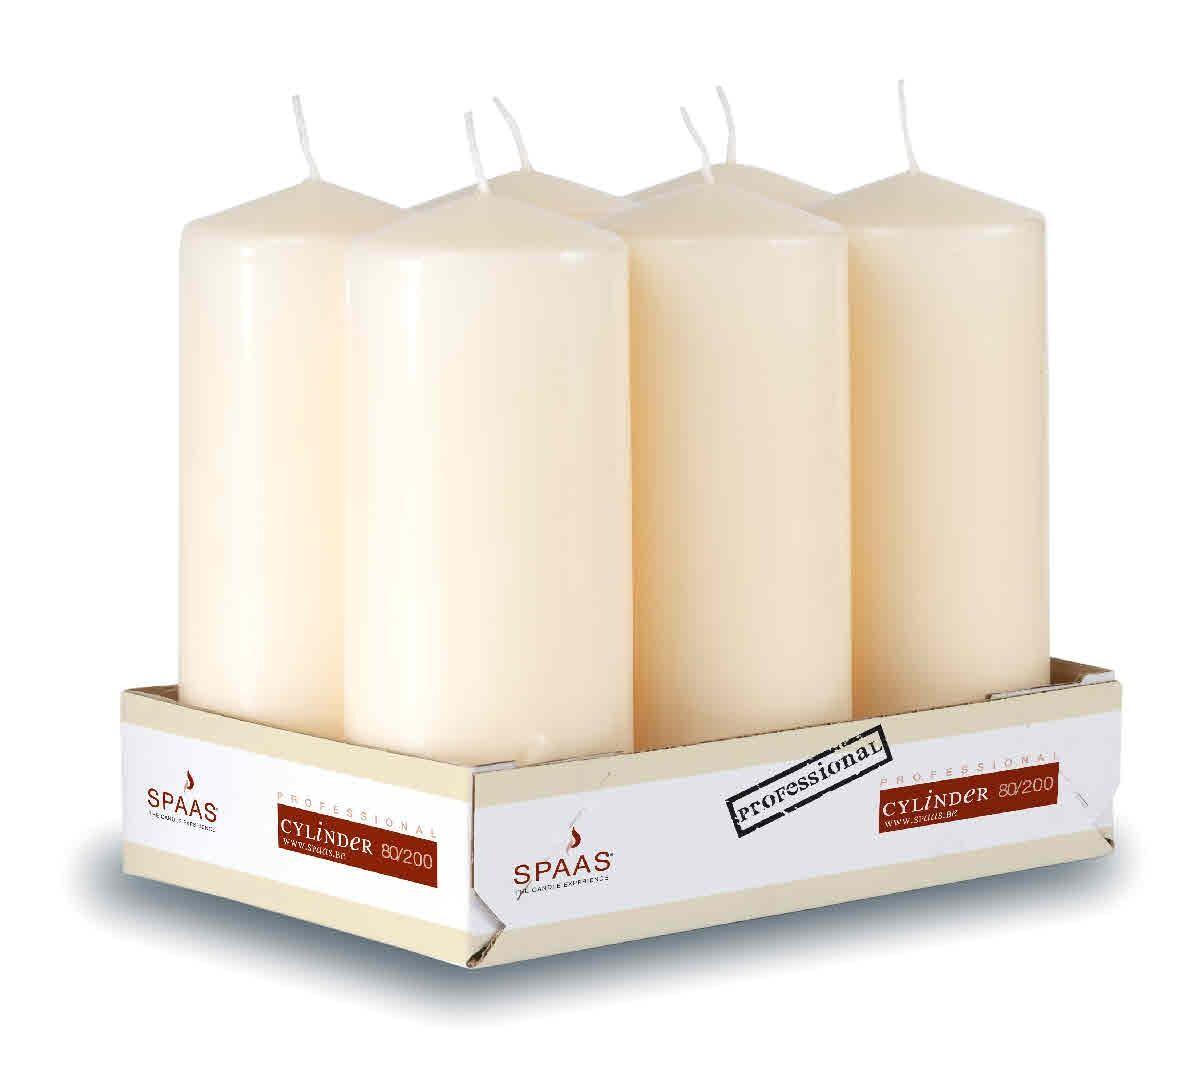 Spaas Pillar Candles ivory 80x200 mm 100h 6pcs